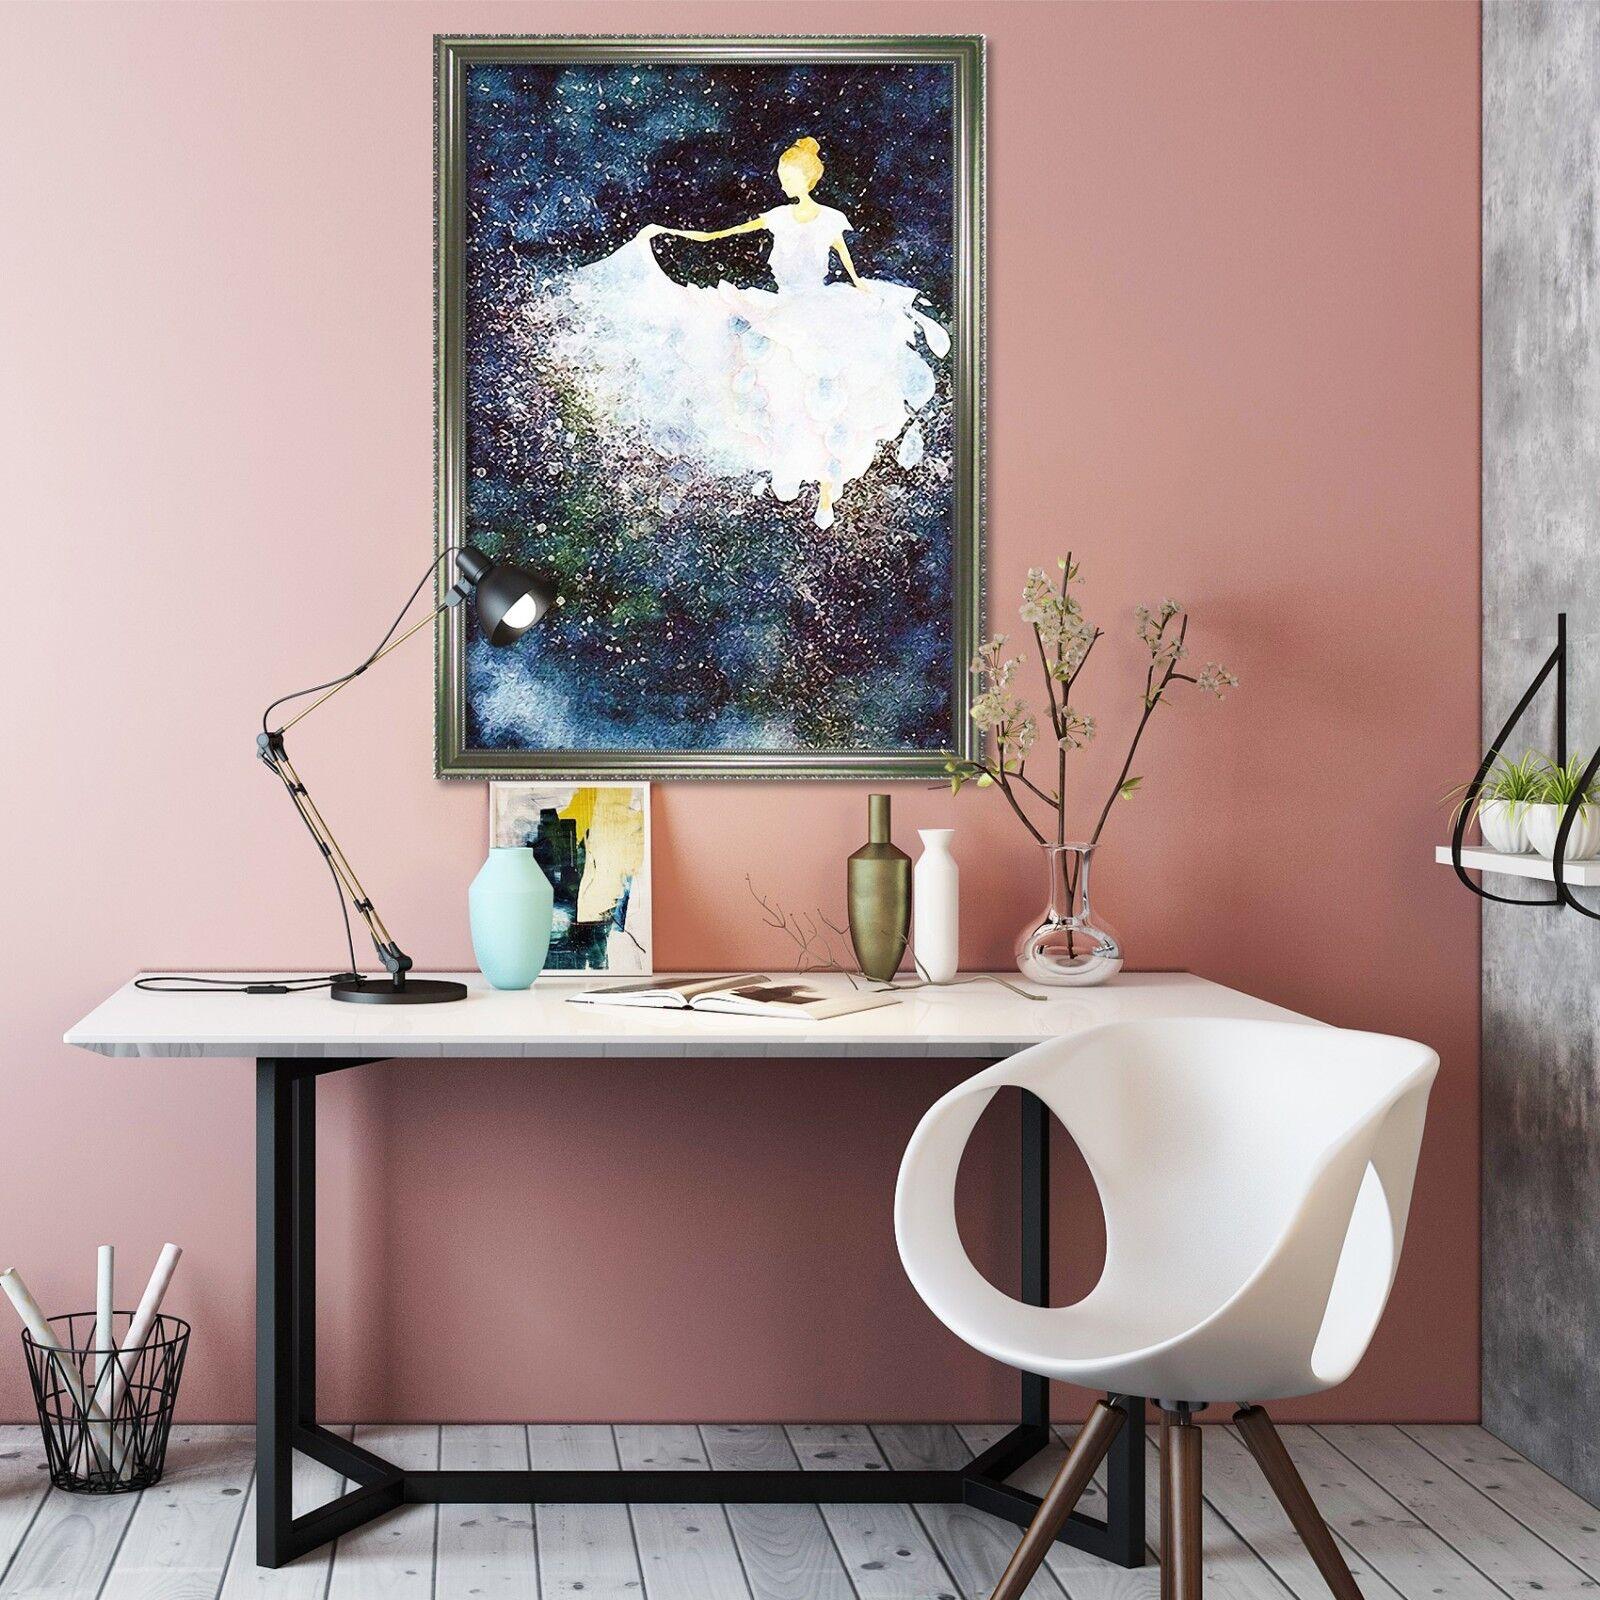 3D bailarina de pintura 2 Enmarcado Cartel Decoración del Hogar Pintura de Impresión Arte Wallpaper